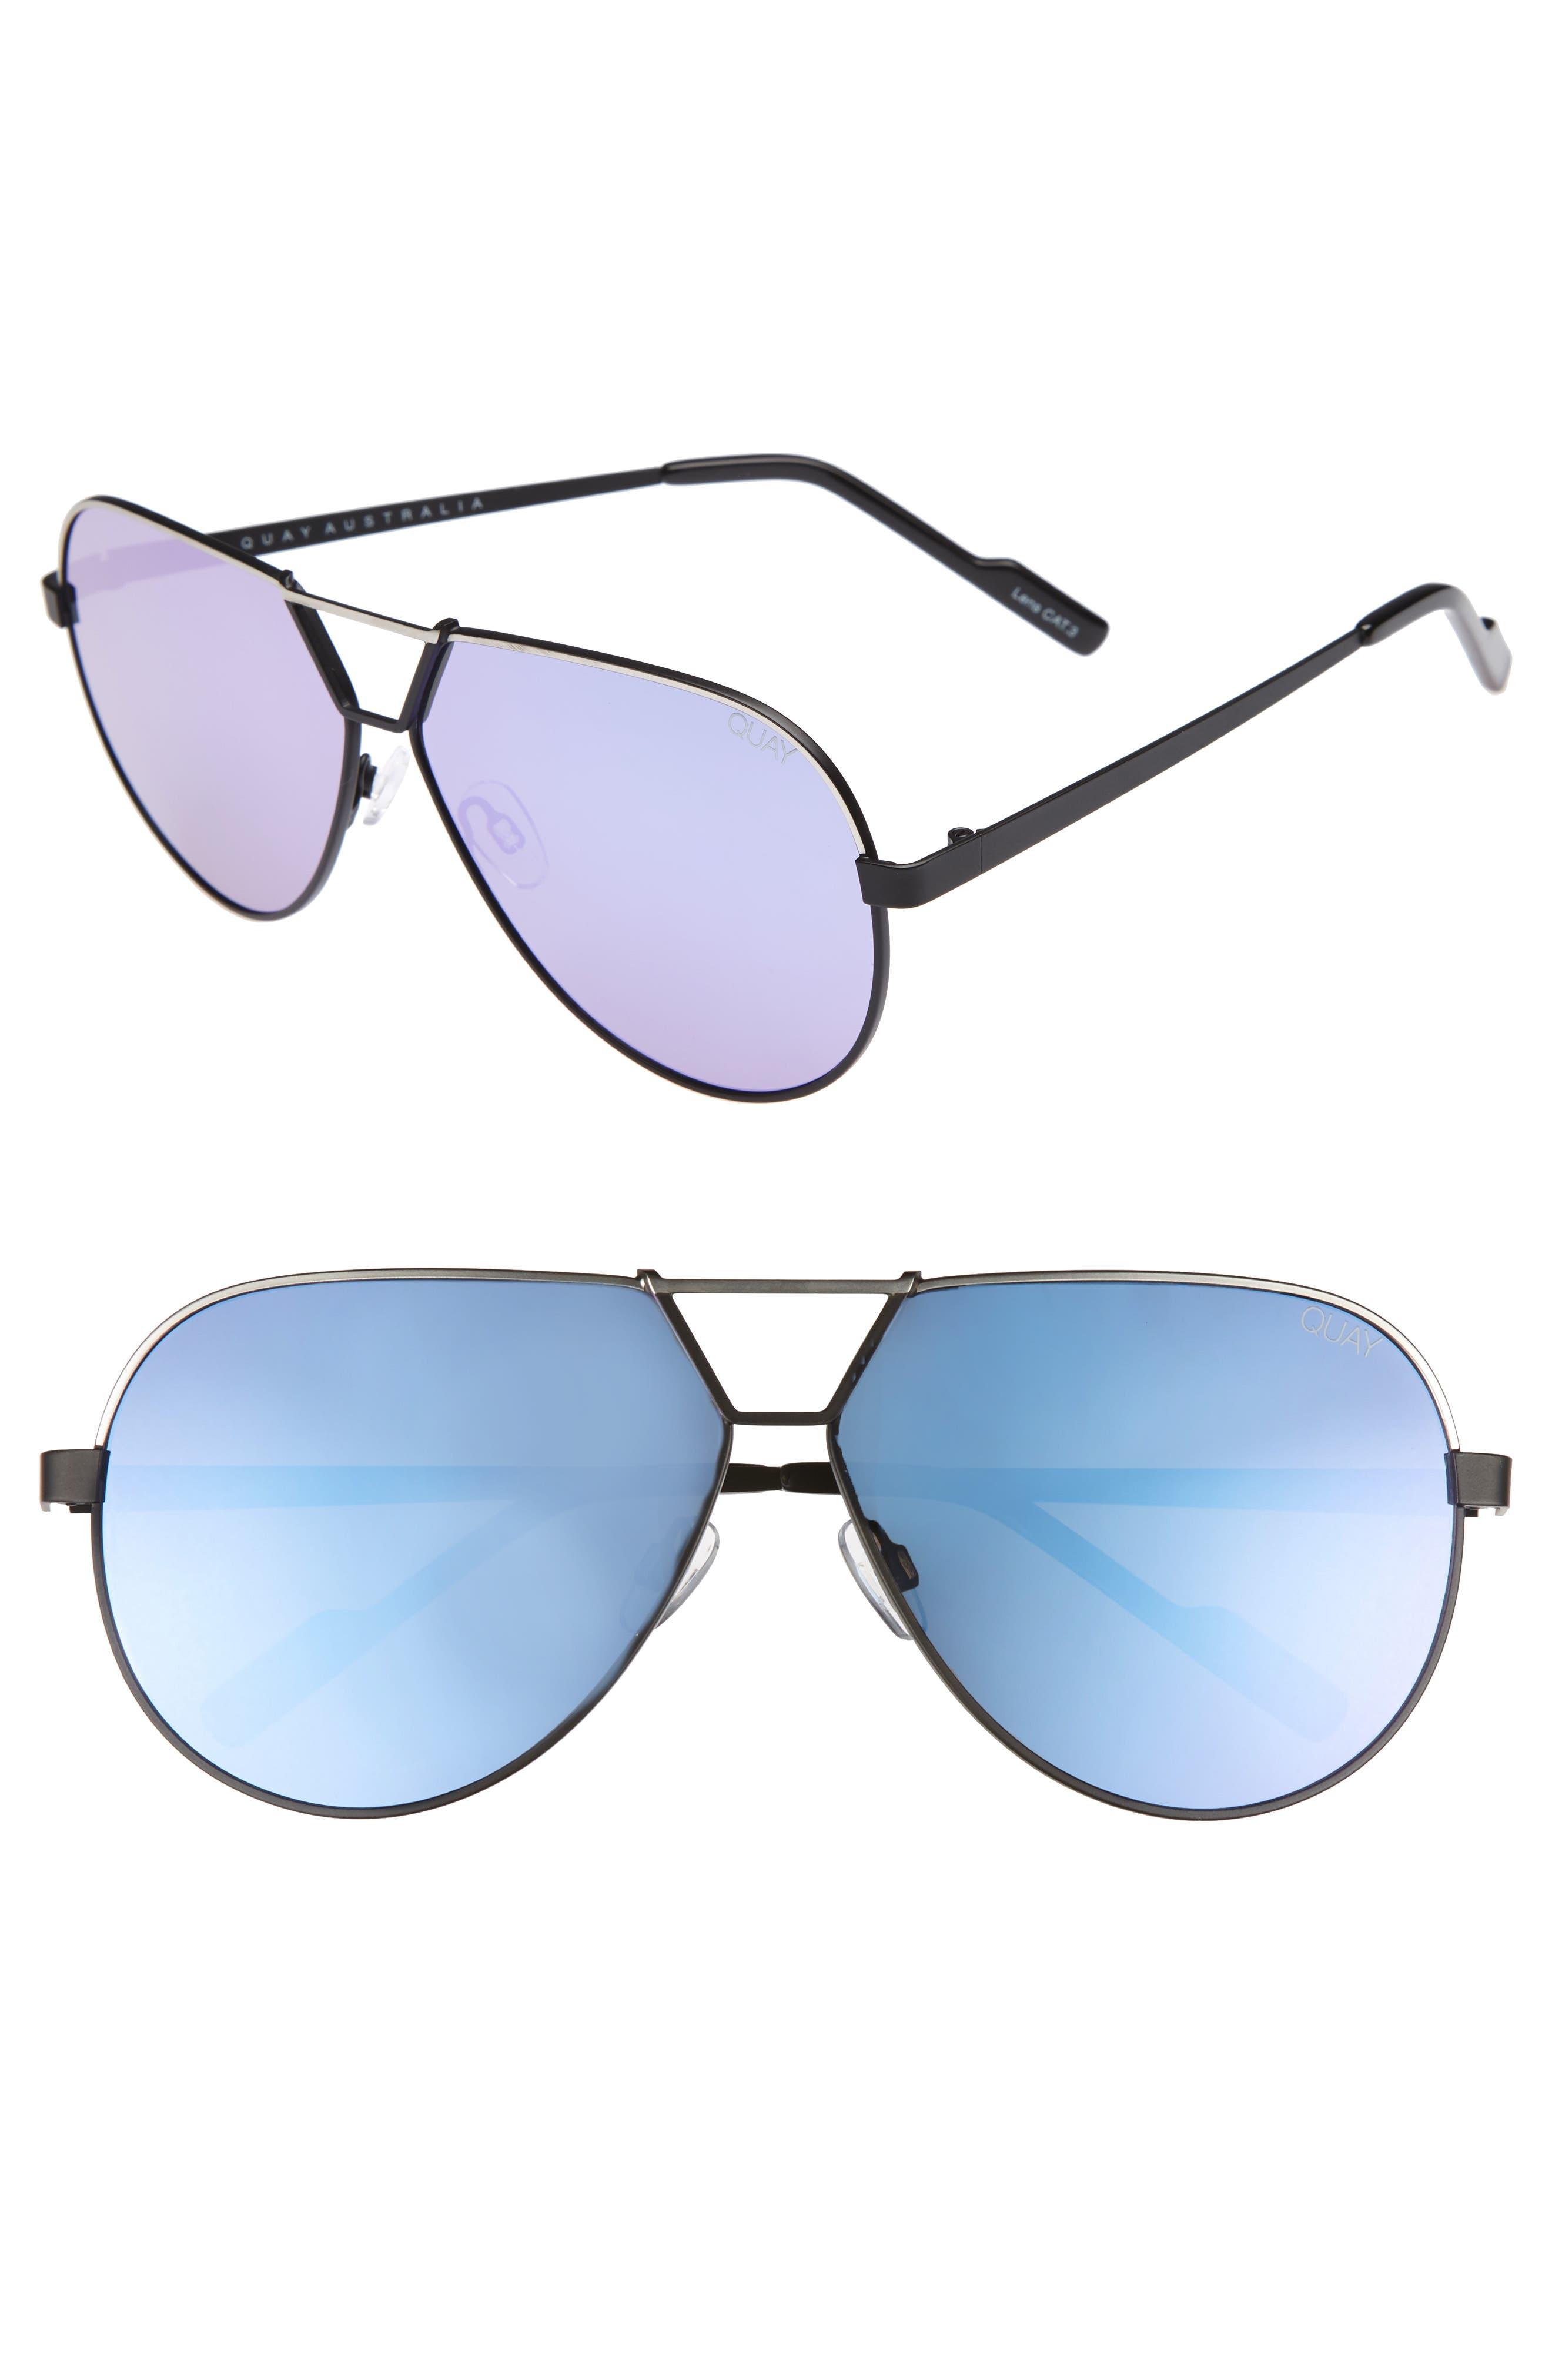 Supernova 63mm Aviator Sunglasses,                         Main,                         color, Black/ Silver/ Purple